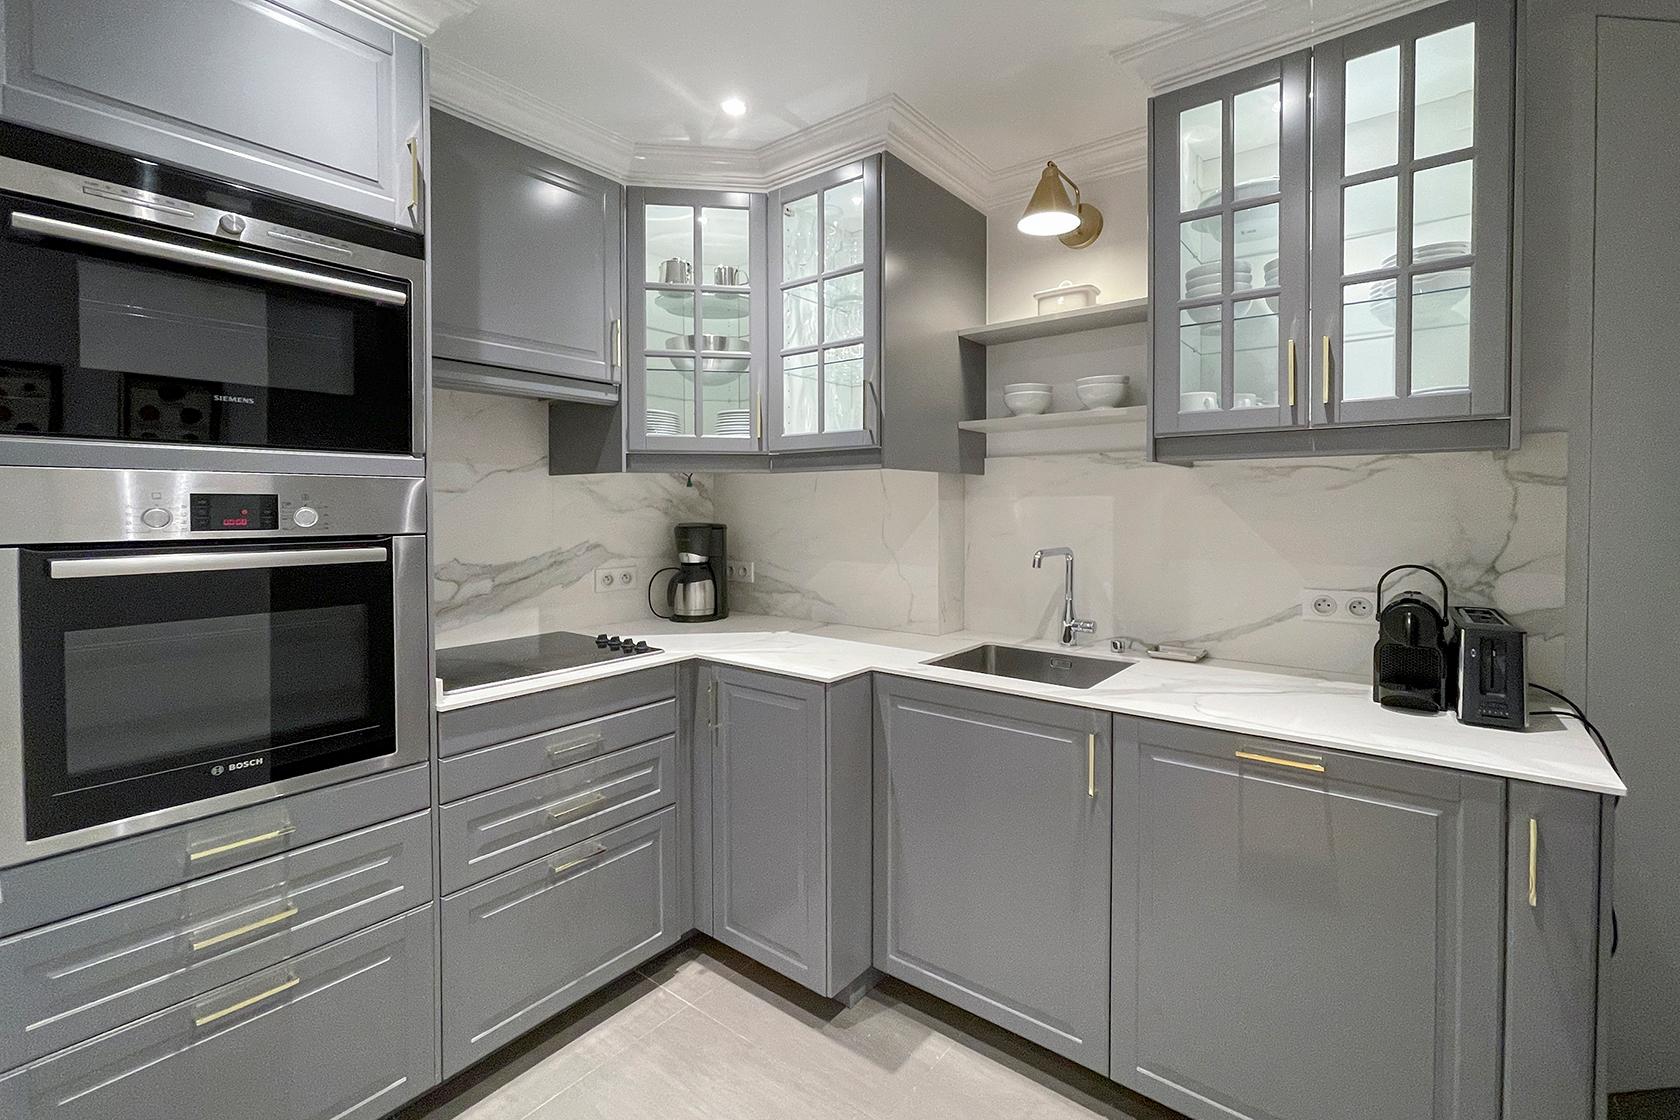 Beaujolais kitchen after